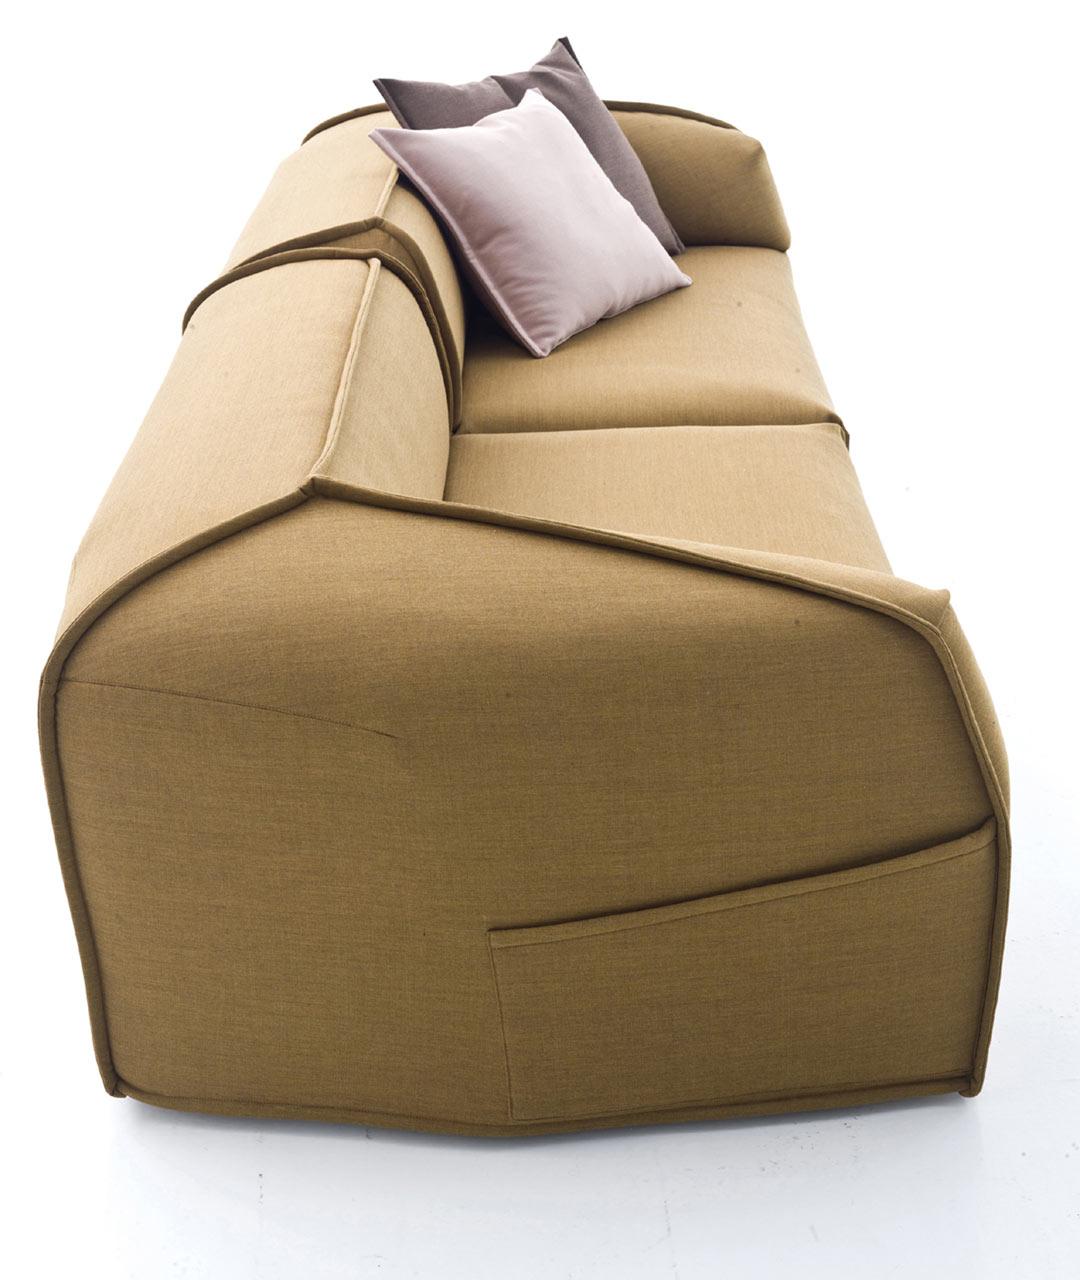 Massas-sofa-system-Moroso-4